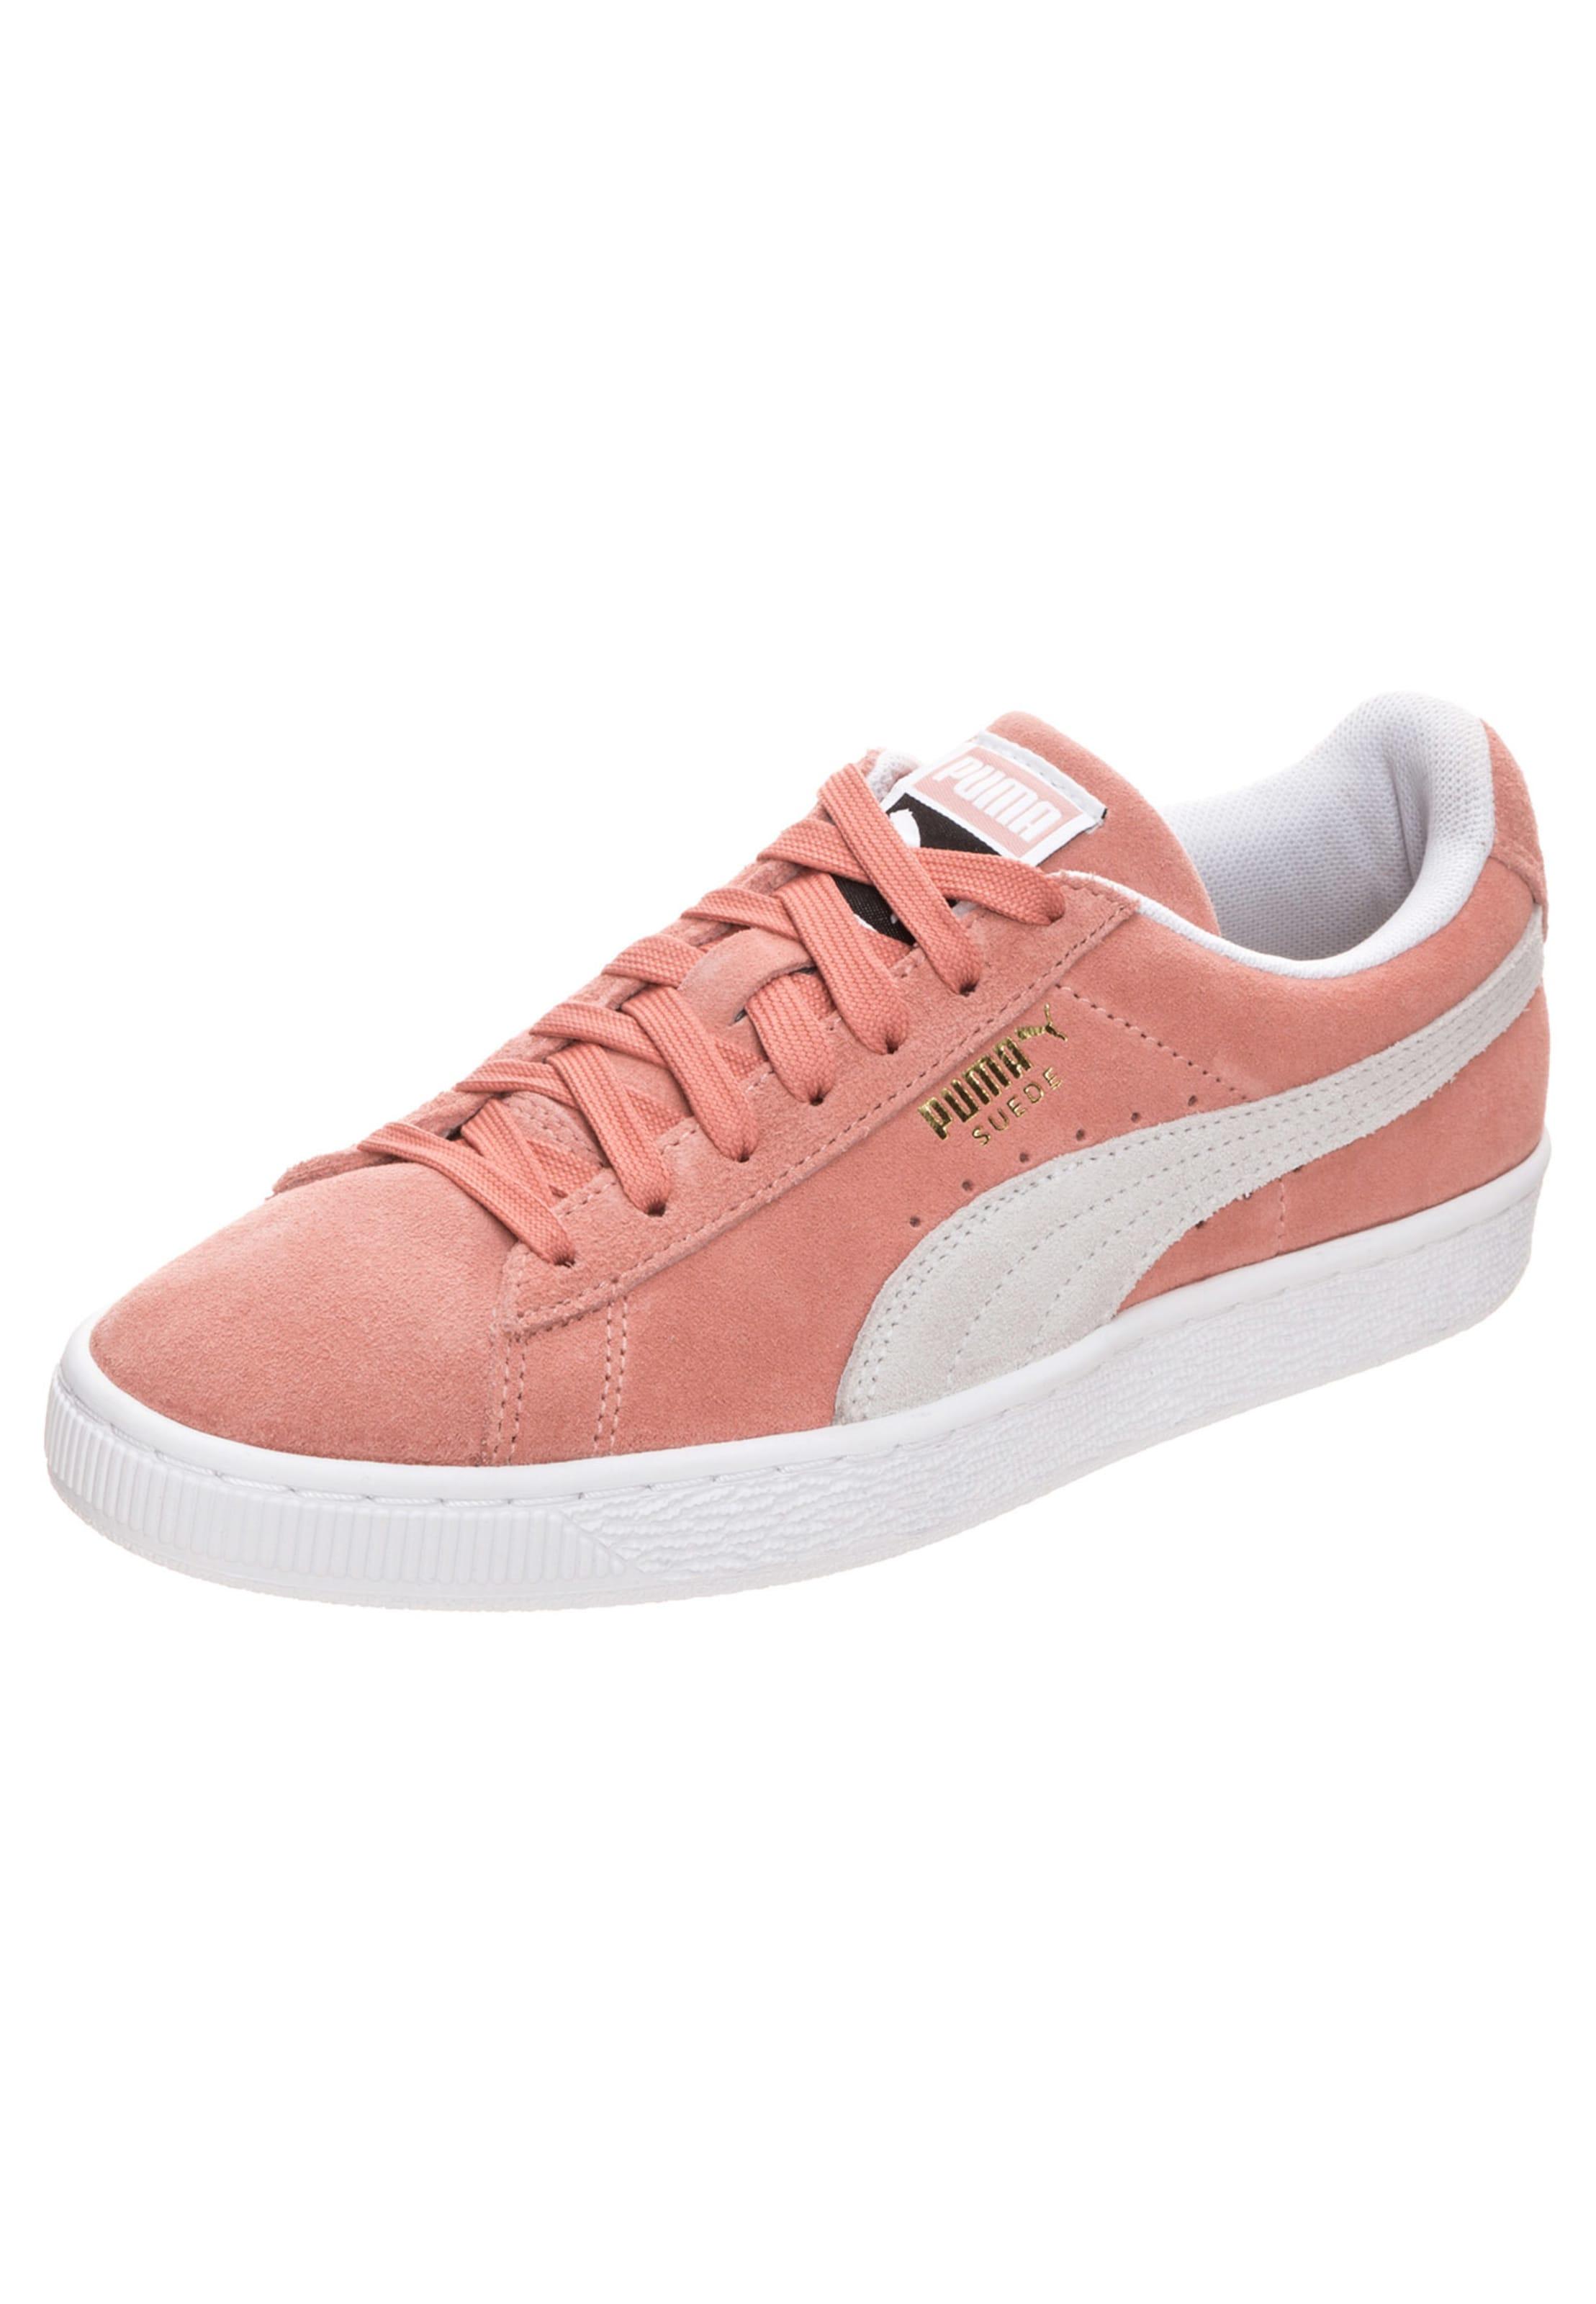 Nike Chaussures De Sport Laag 'blazer Bas' Oudroze REmmy